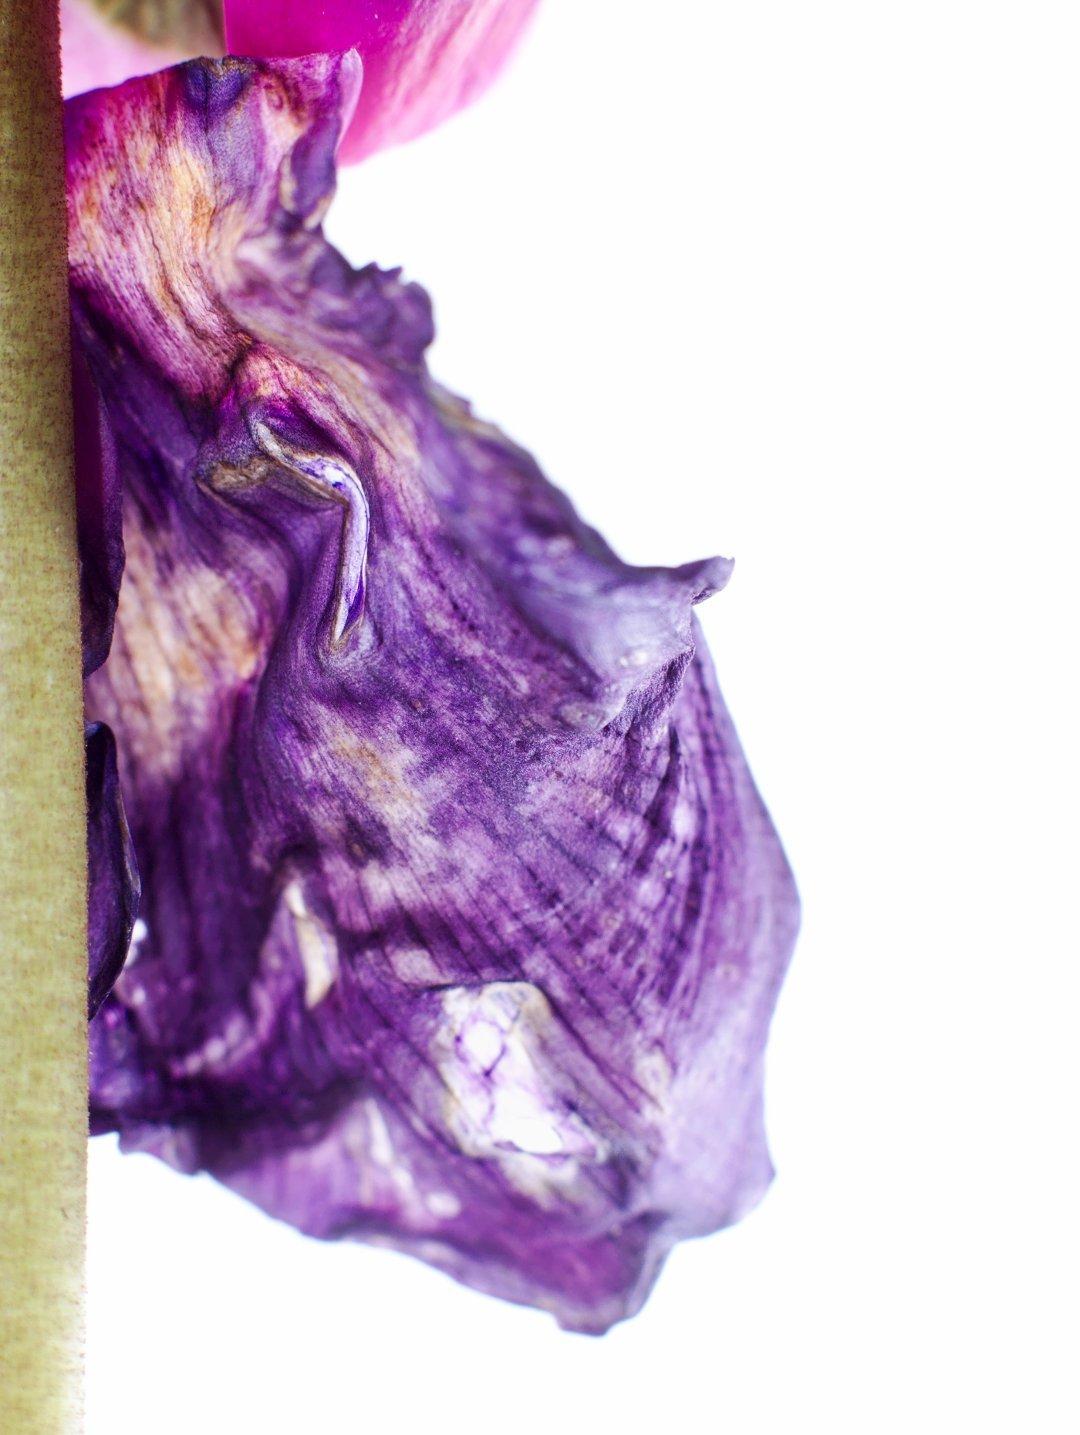 Imperfect Cyclamen Flower